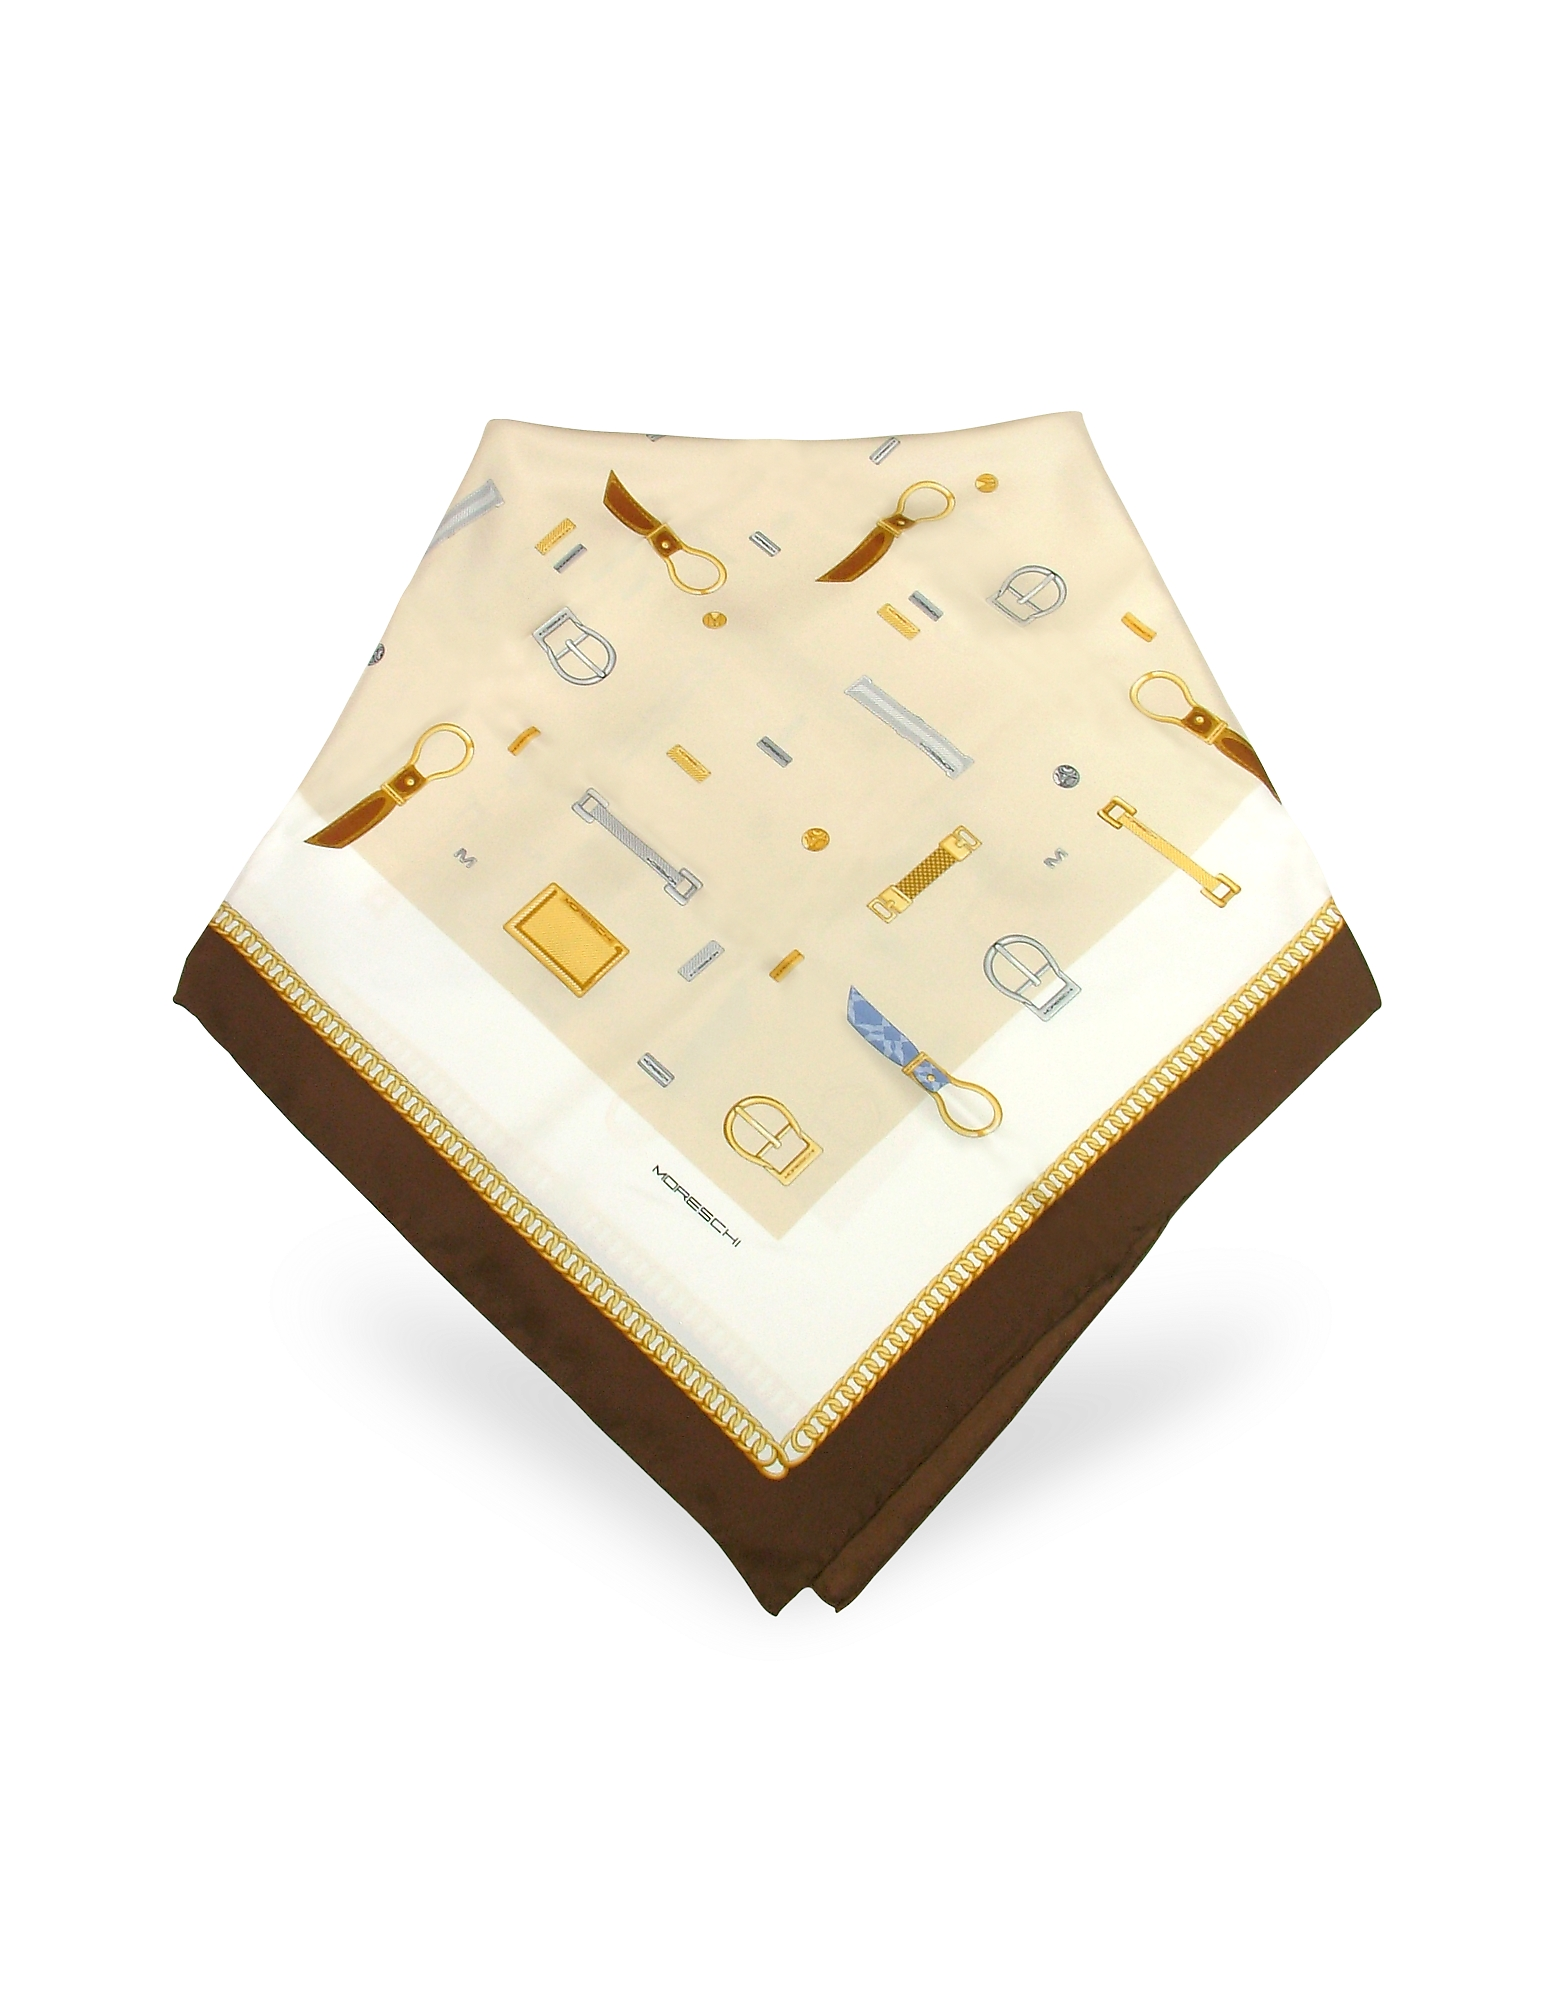 Moreschi Square Scarves, Buckle Print Twill Silk Square Scarf